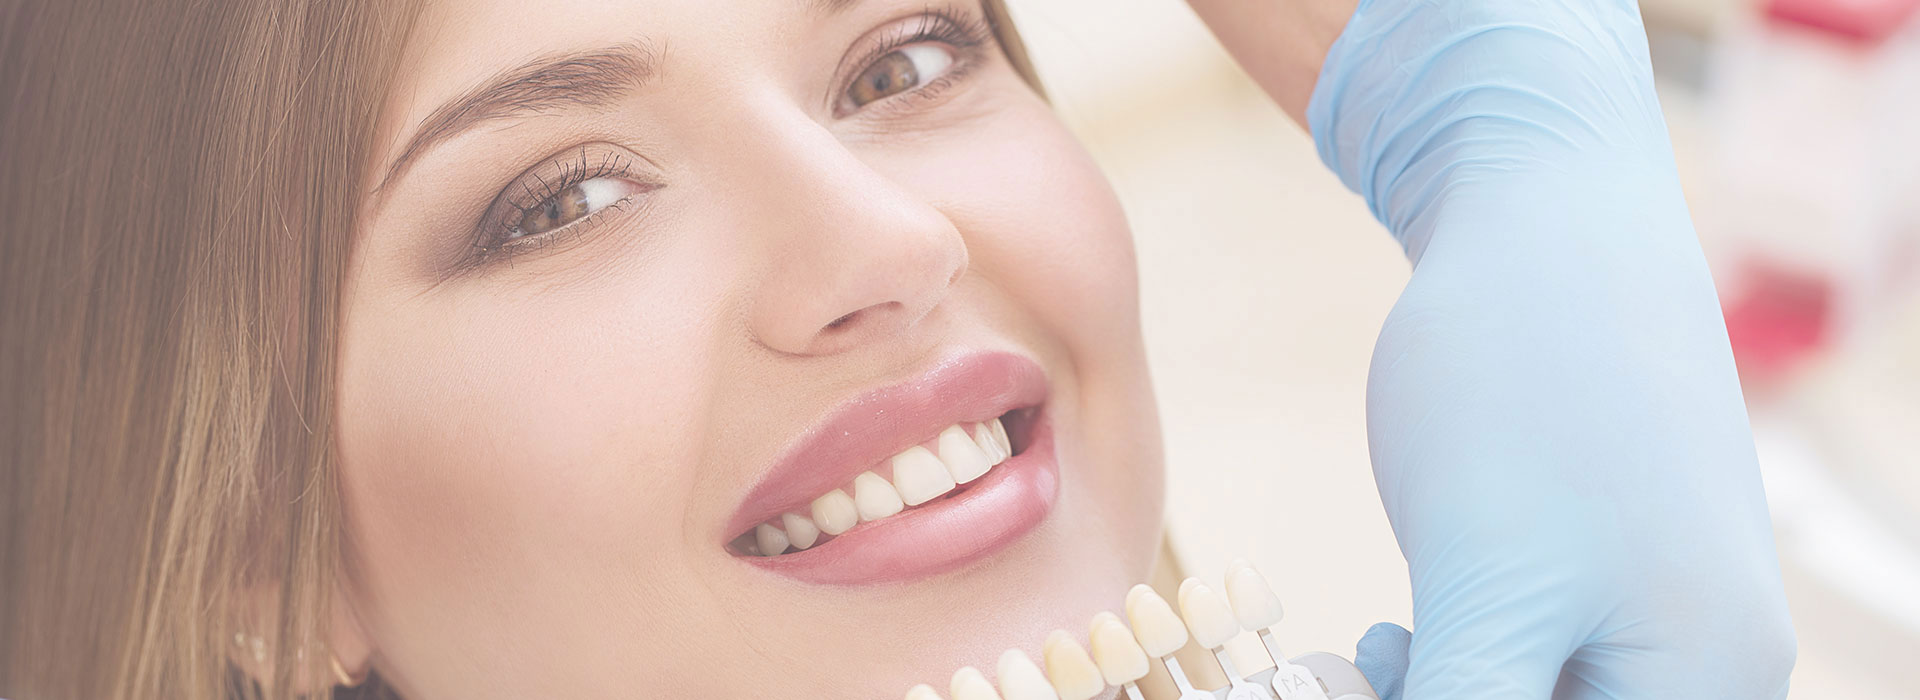 Woman smiling at dental clinic